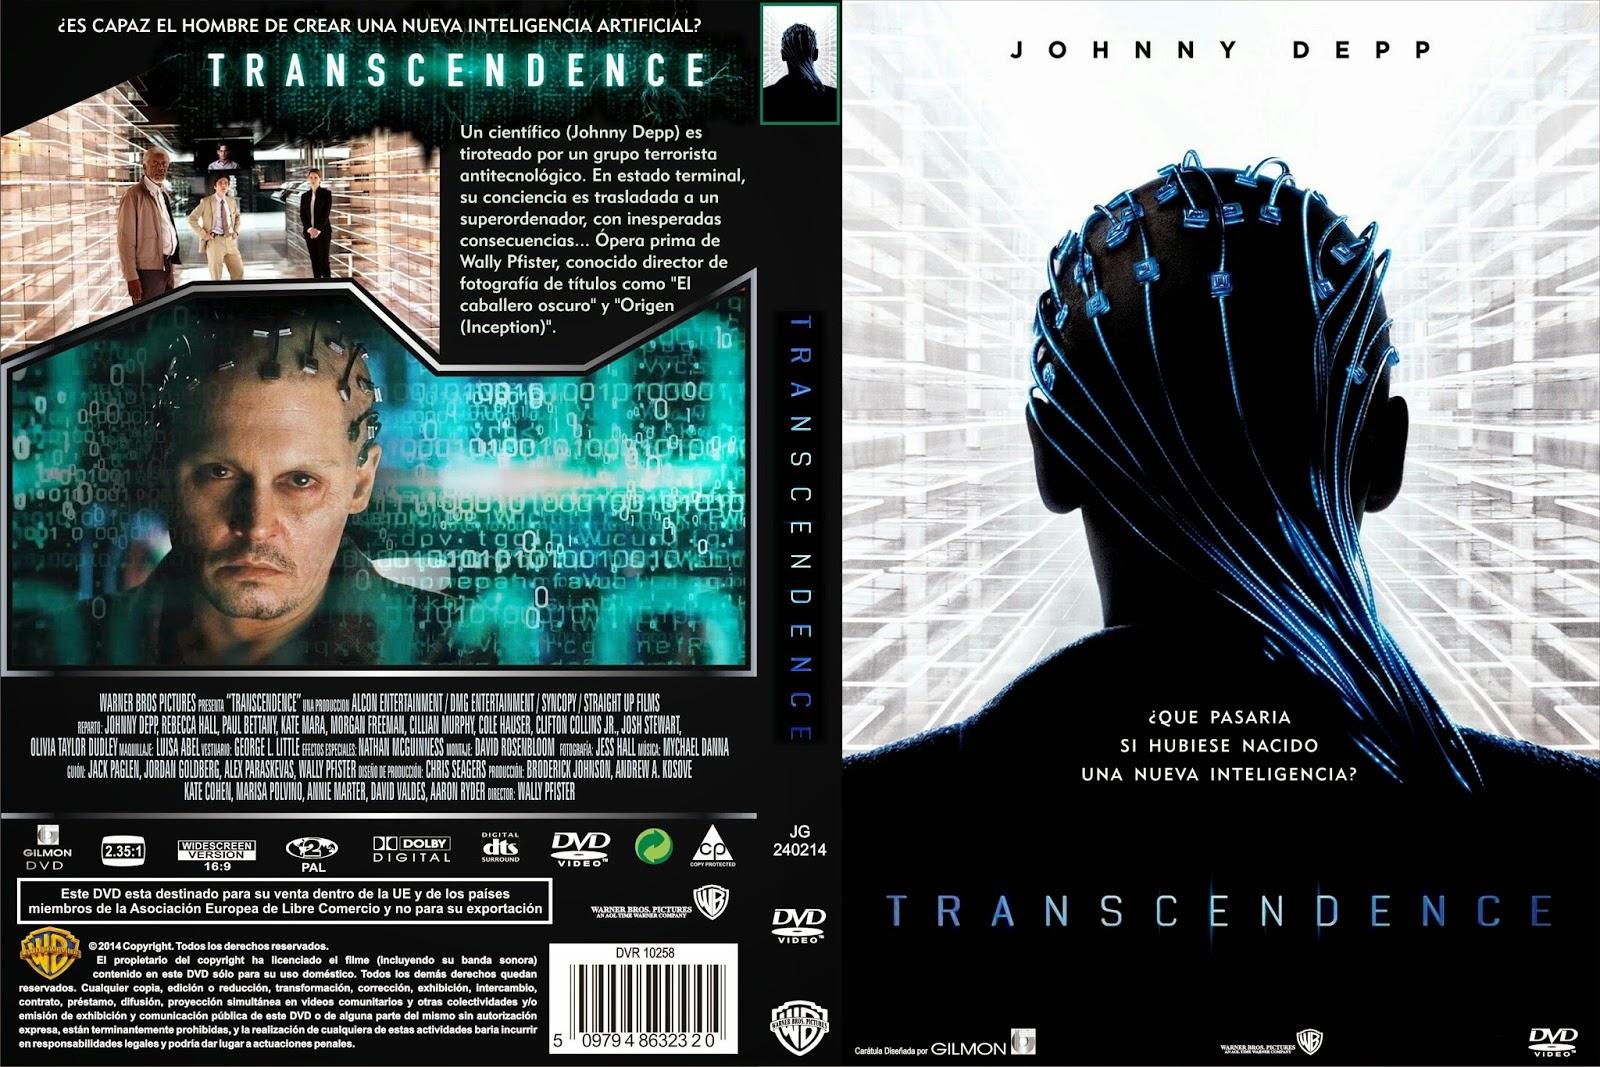 UCreative.com - Top 15 DVD Cover Art Designs of 2008 ...   Transcendence Dvd Cover Art